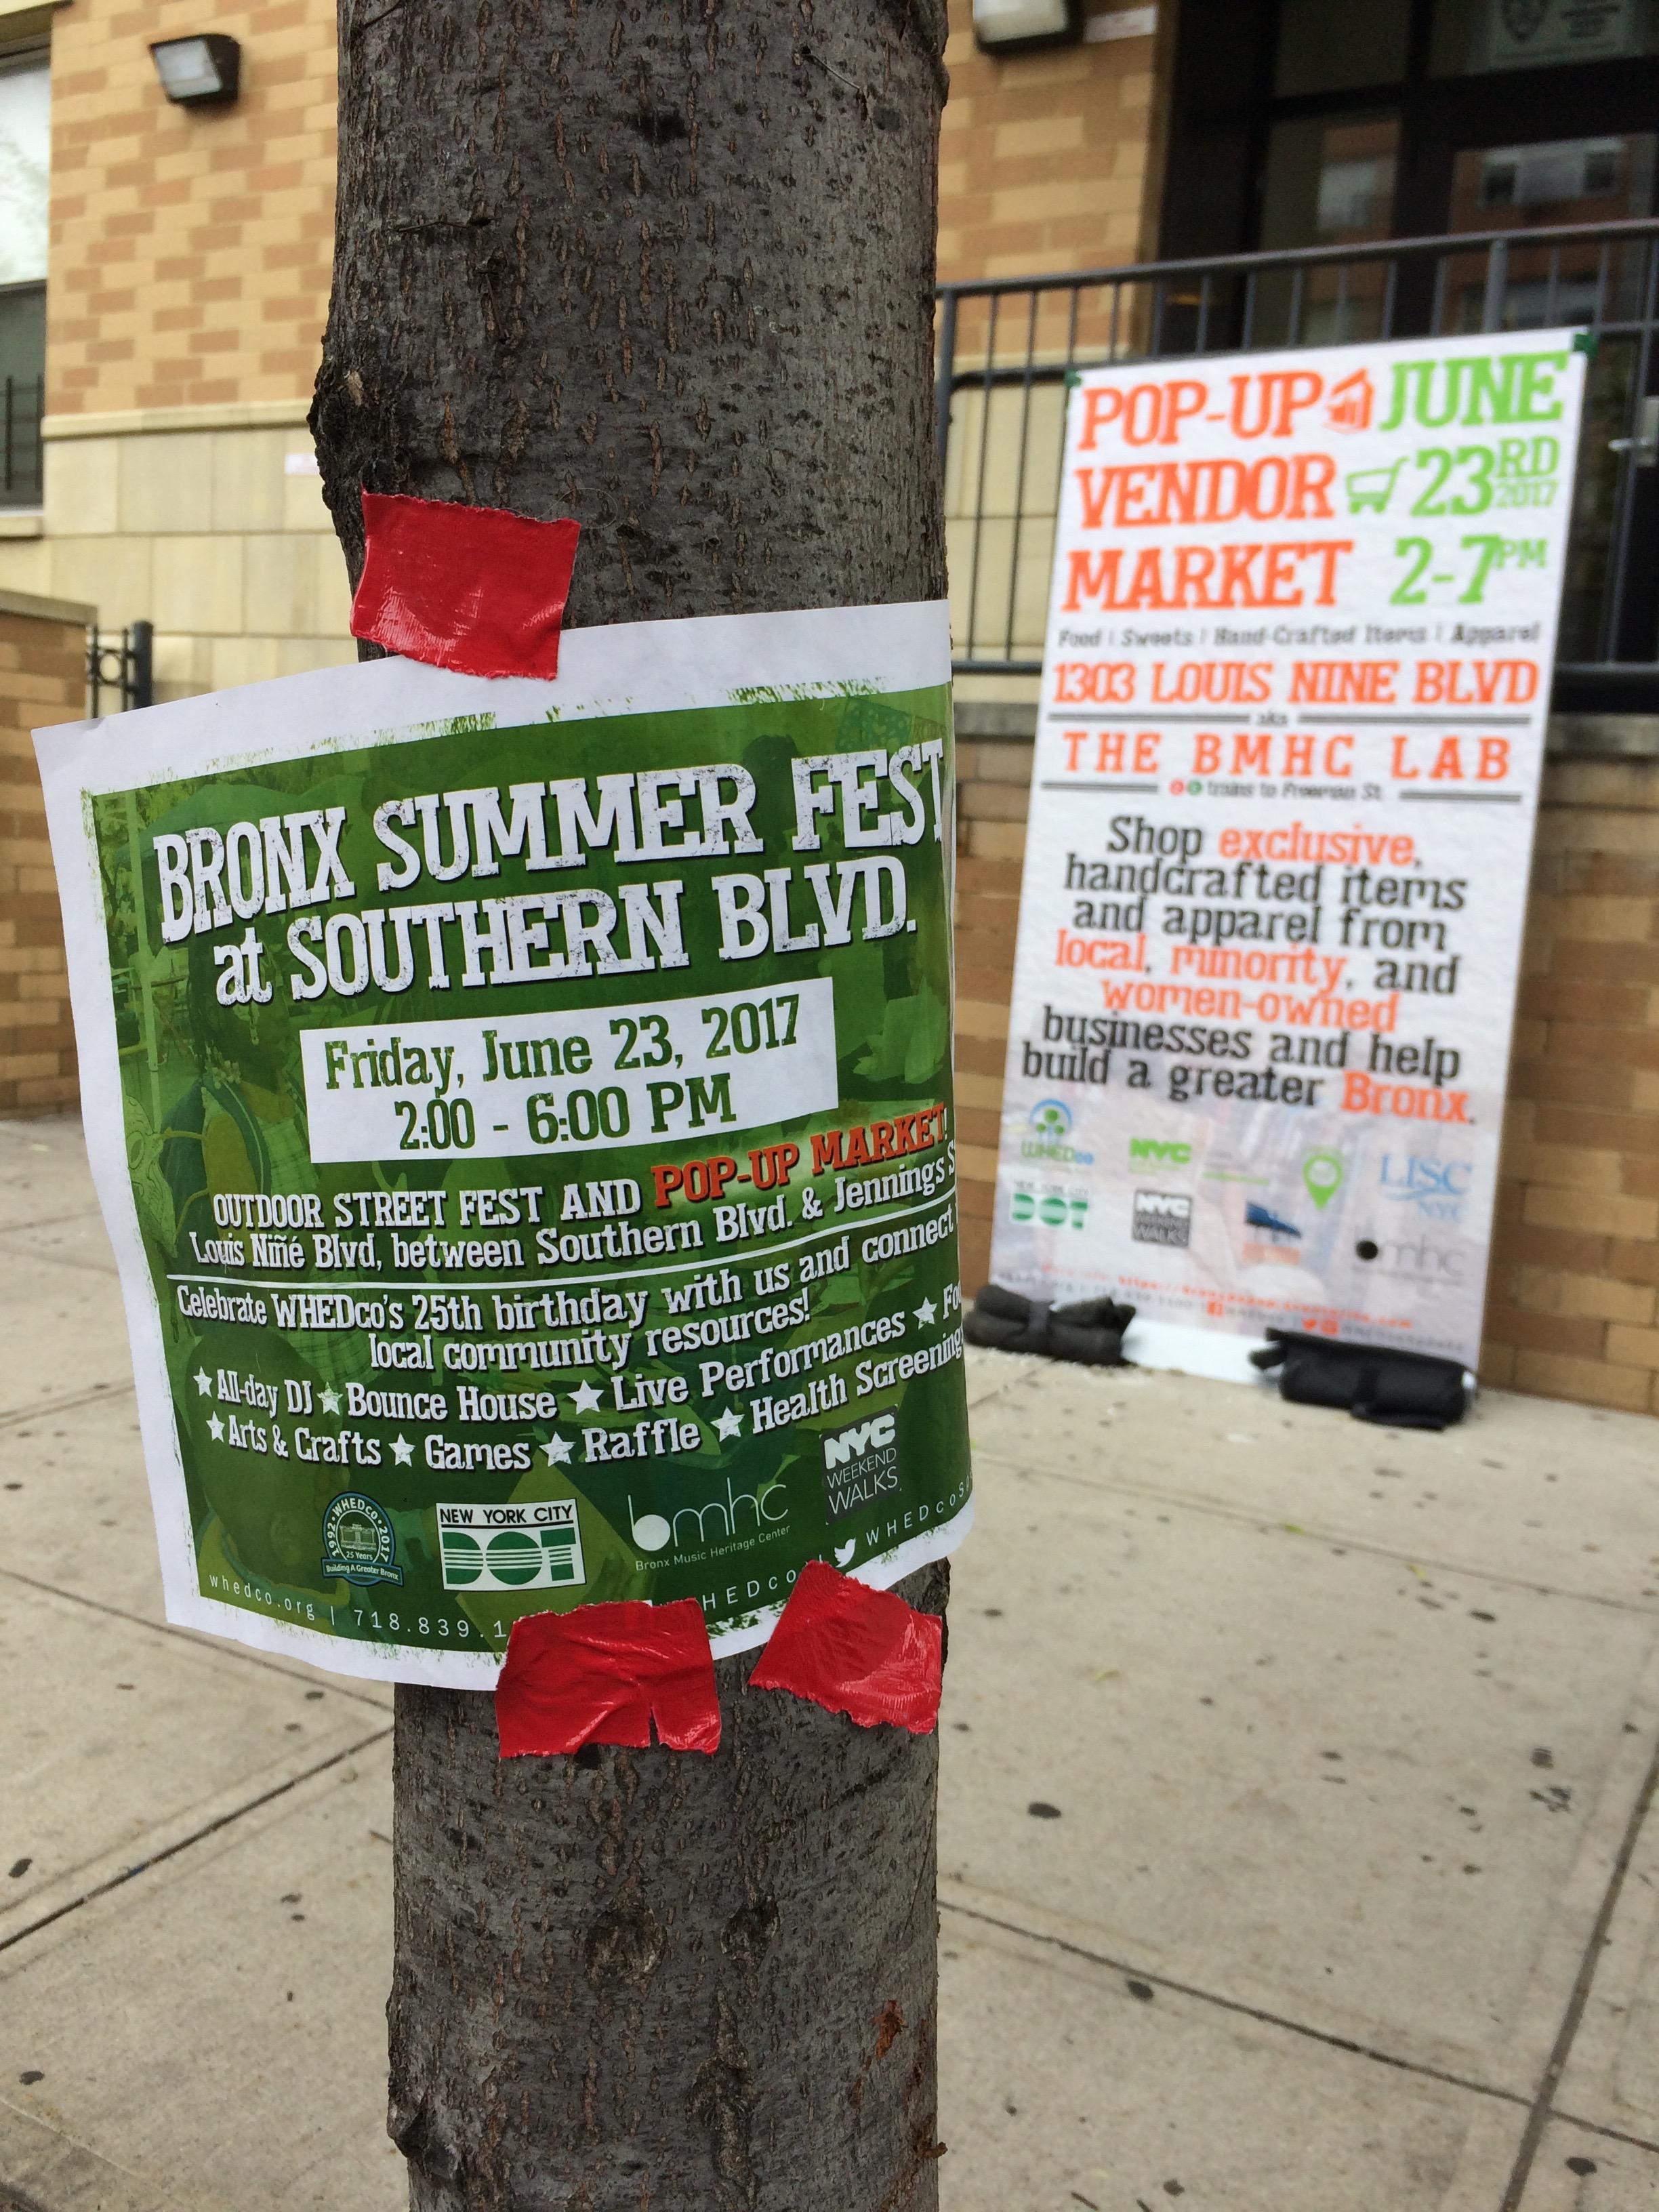 Bronx Summer Fest 3